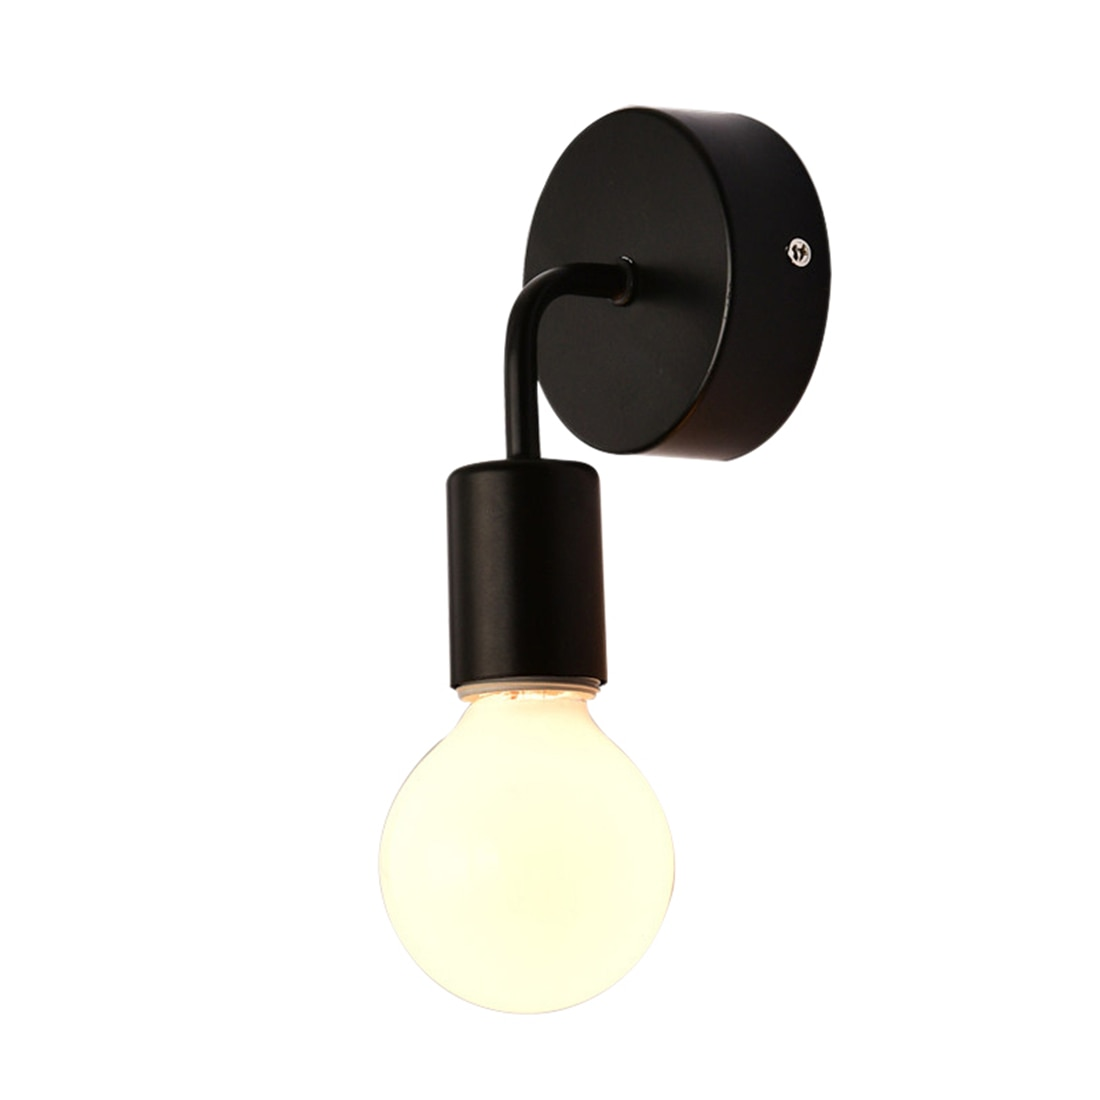 Lámpara de pared Simple de hierro antiguo negro para Loft, lámpara de pared con ventosa para pasillo, Bar, restaurante americano, pared